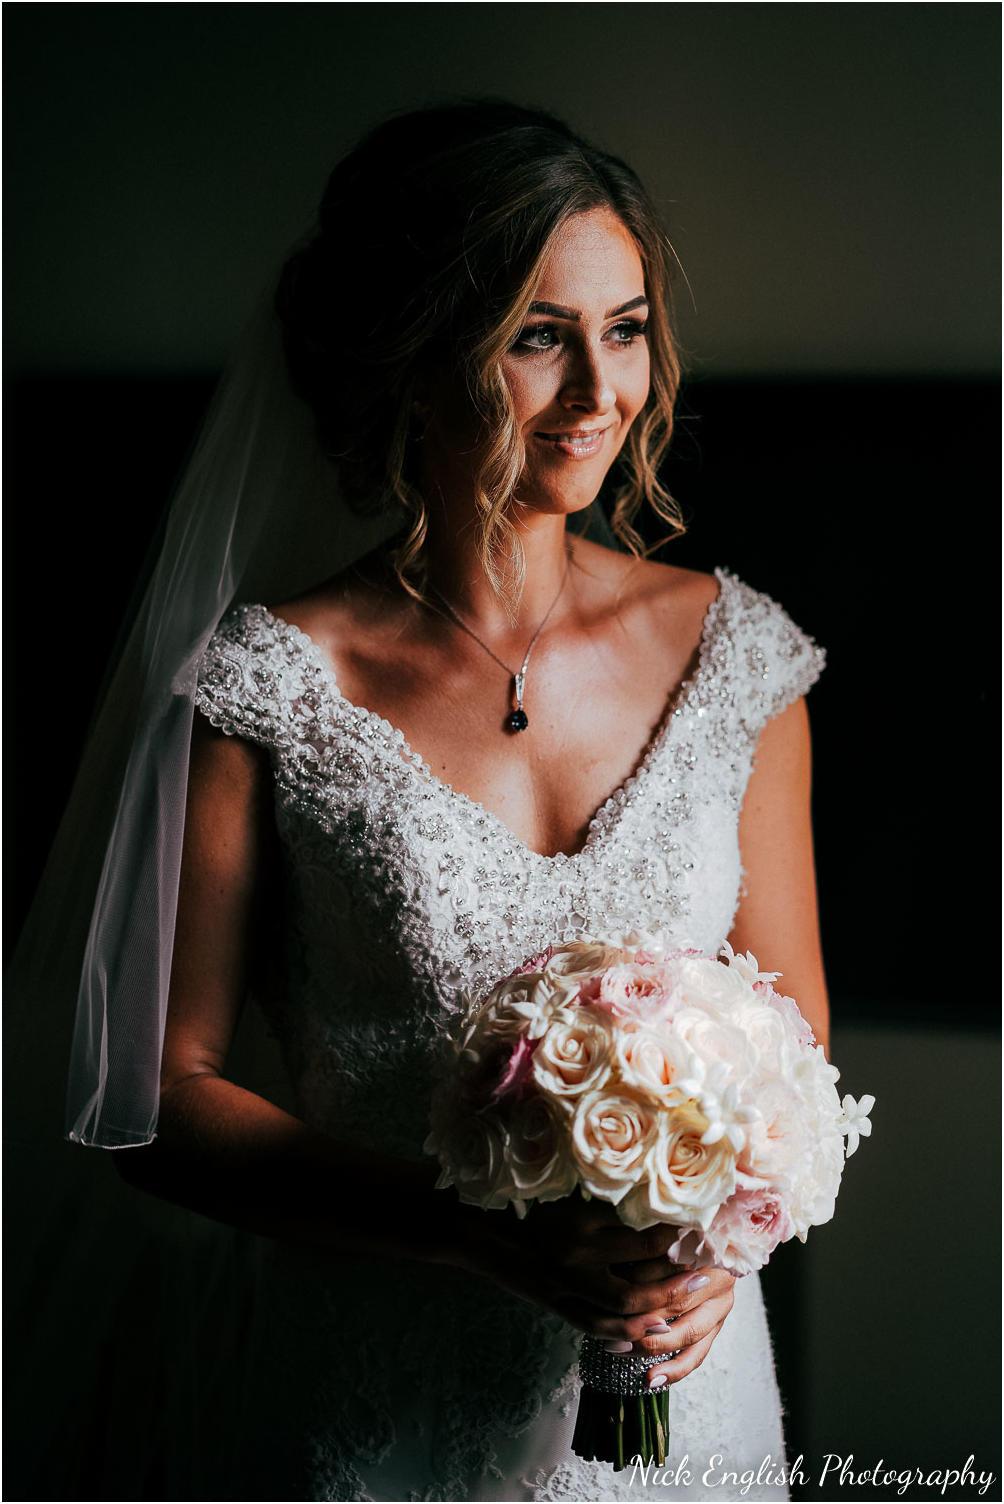 Destination_Wedding_Photographer_Slovenia_Nick_English_Photography-32.jpg